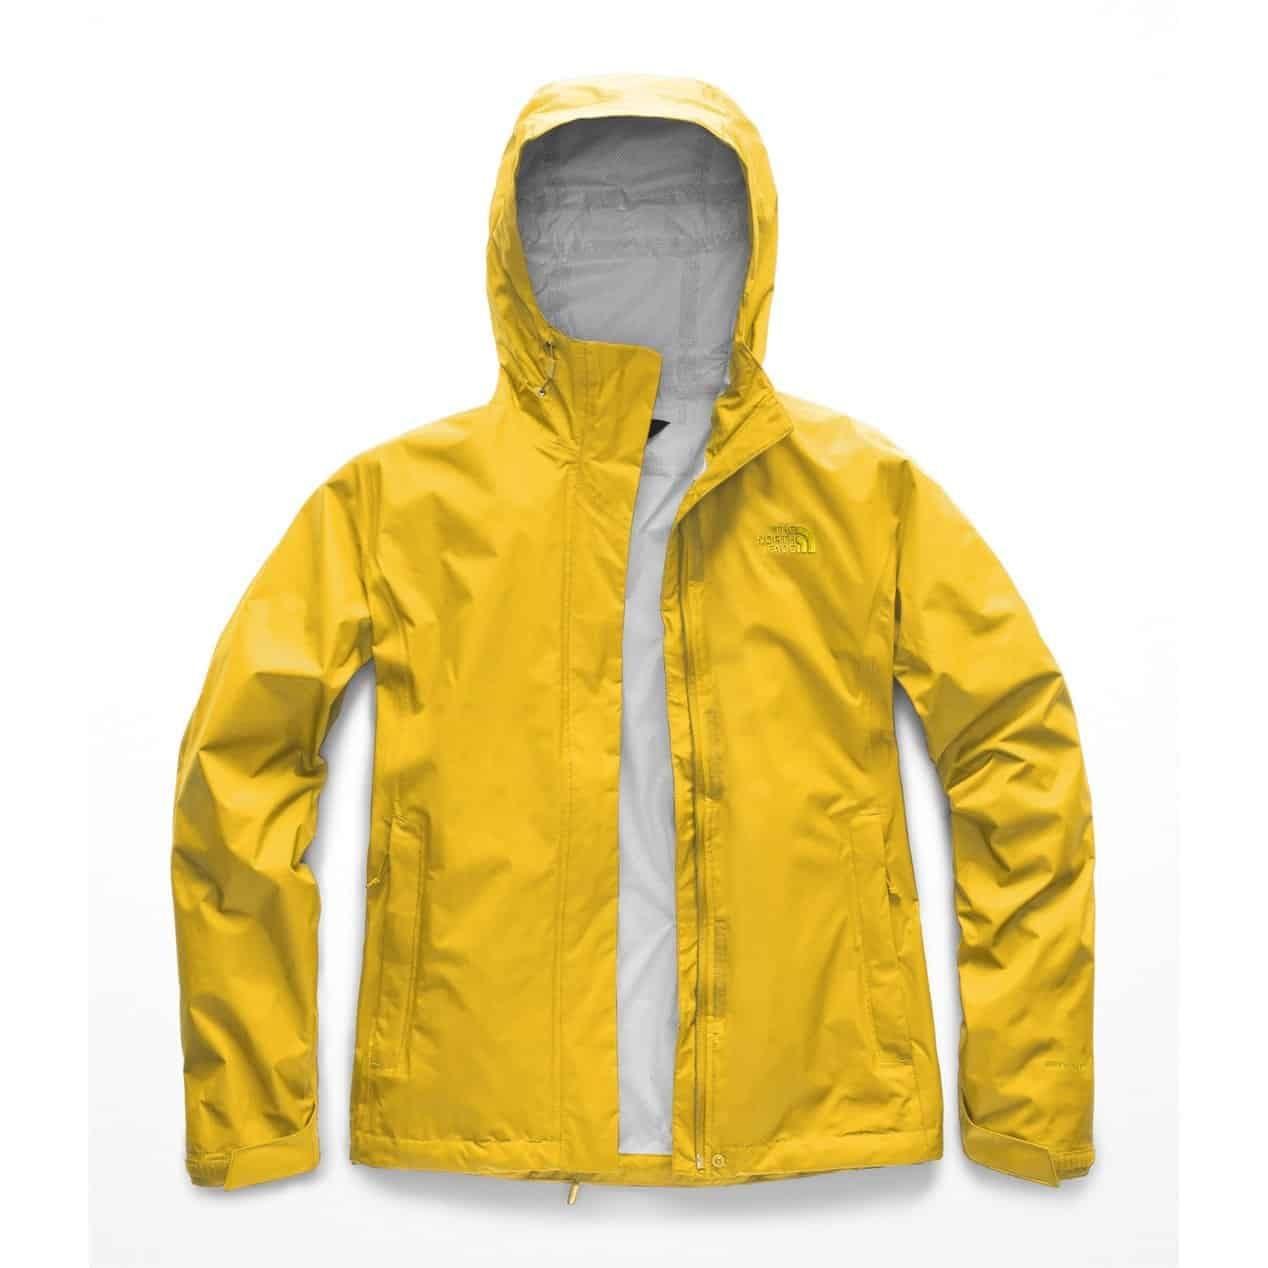 6252c9978 The North Face: Resolve 2 Raincoat VS Venture 2 Raincoat - Altitude Blog